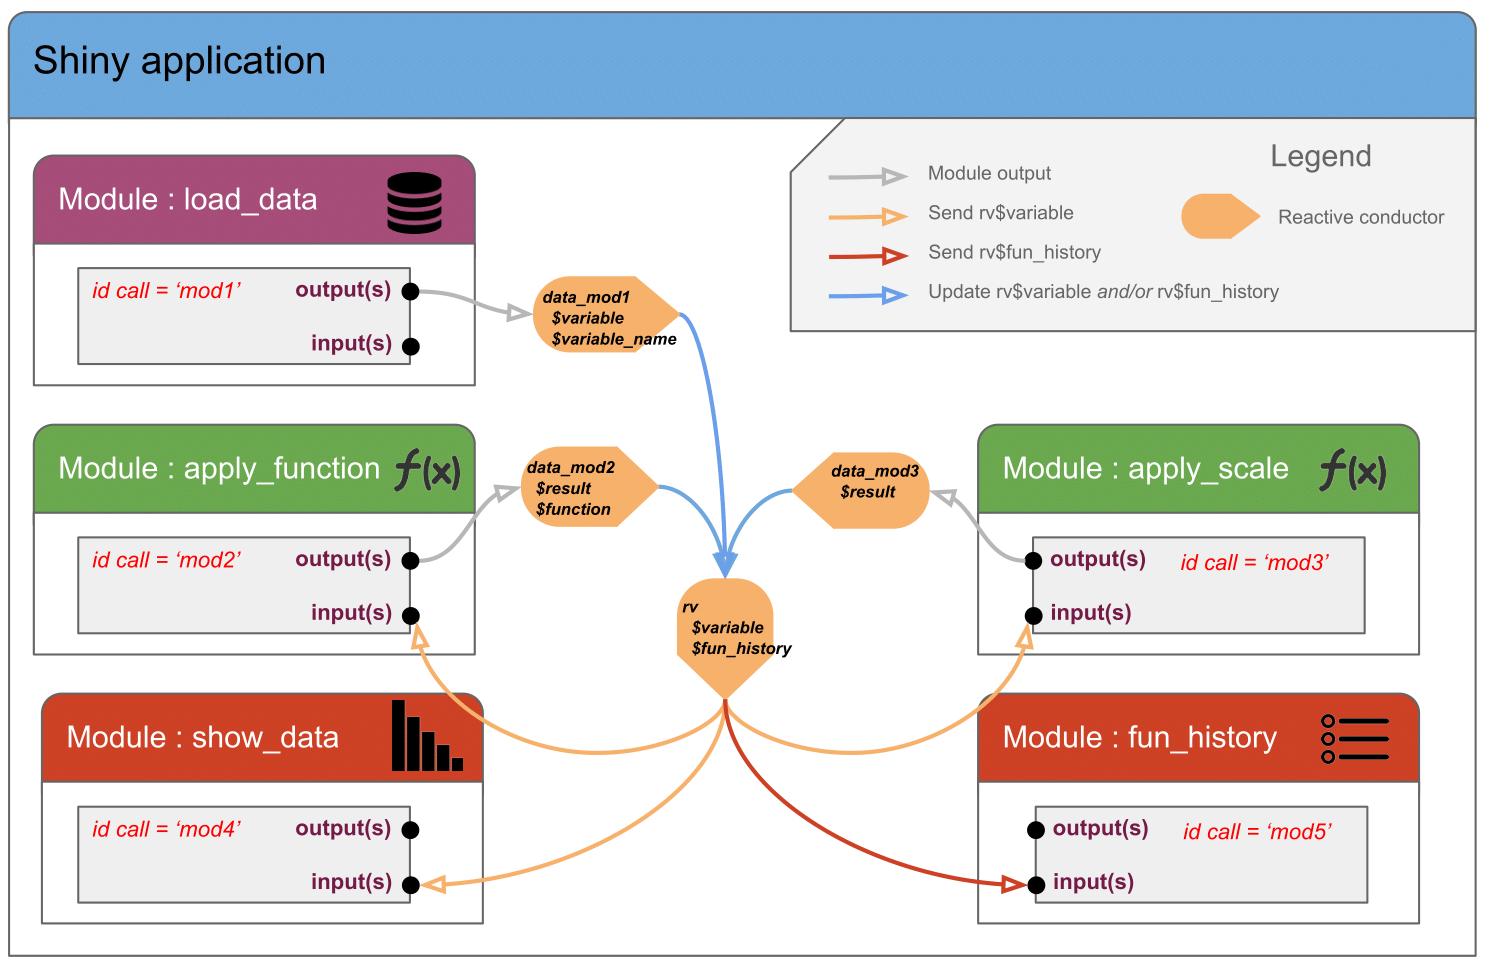 Shiny Modules (part 2): Share reactive among multiple